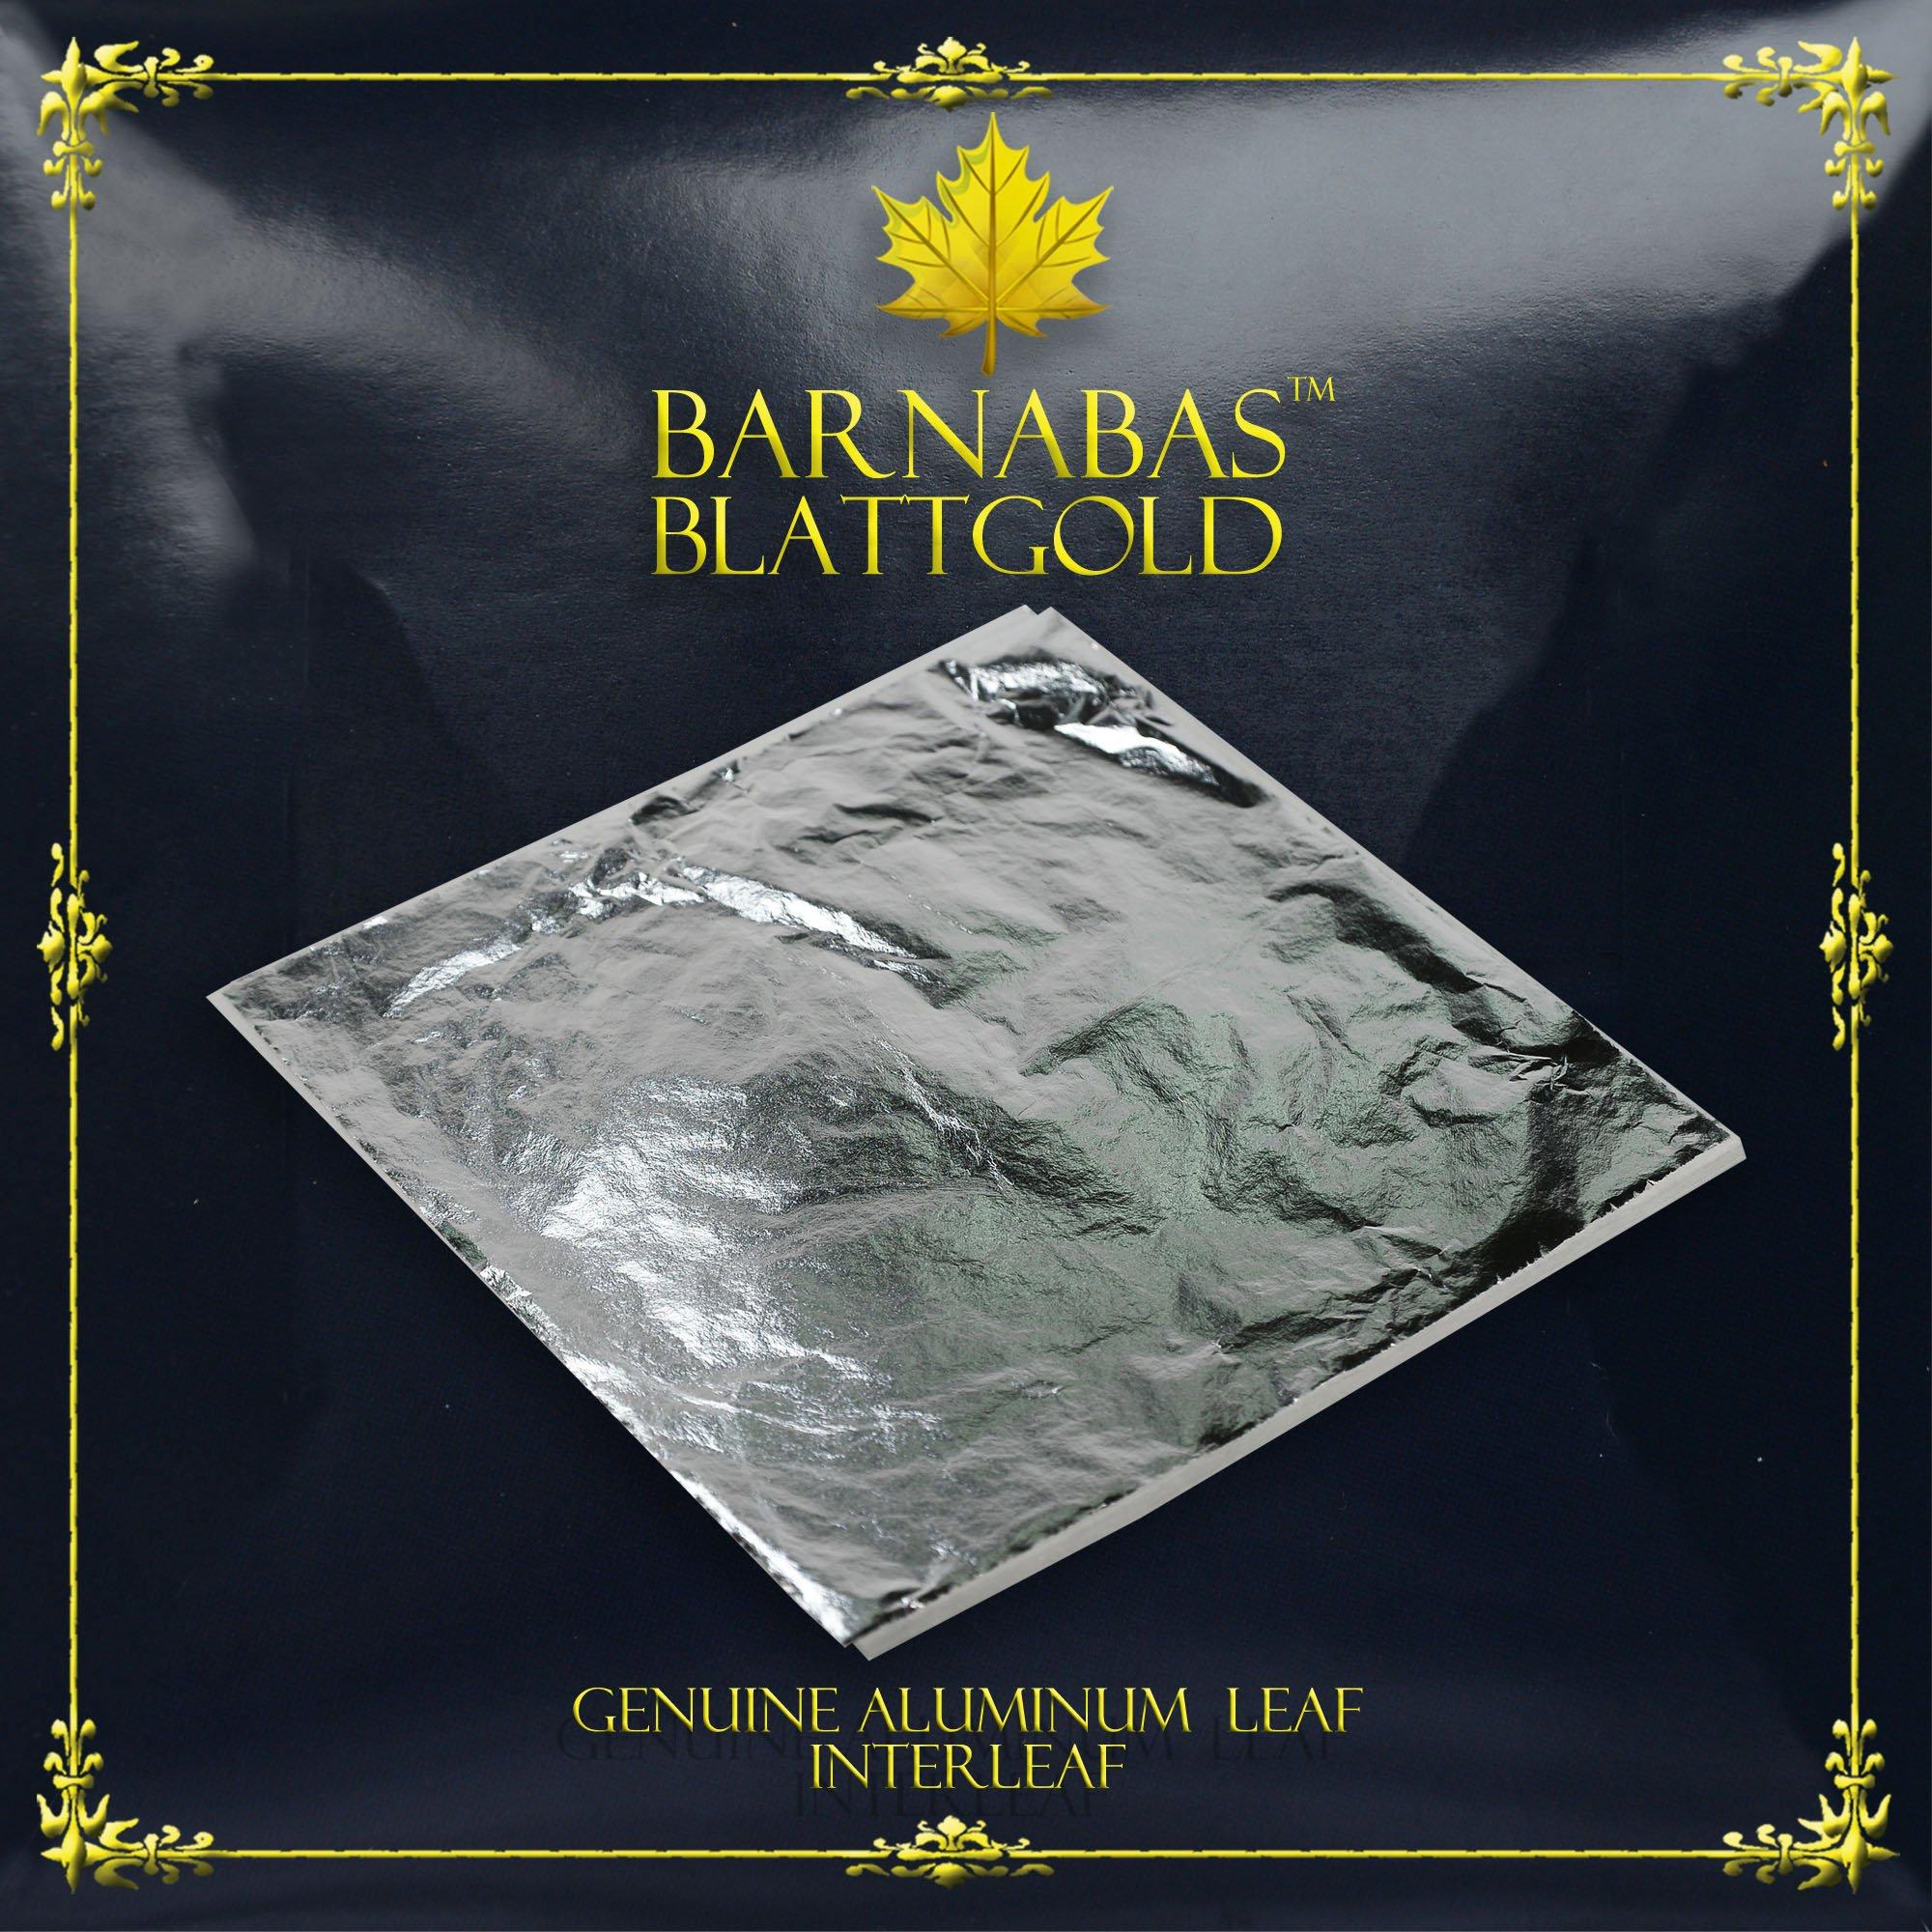 Imitation Silver Leaf 1000 Sheets,16cm Interleaved by BARNABAS BLATTGOLD